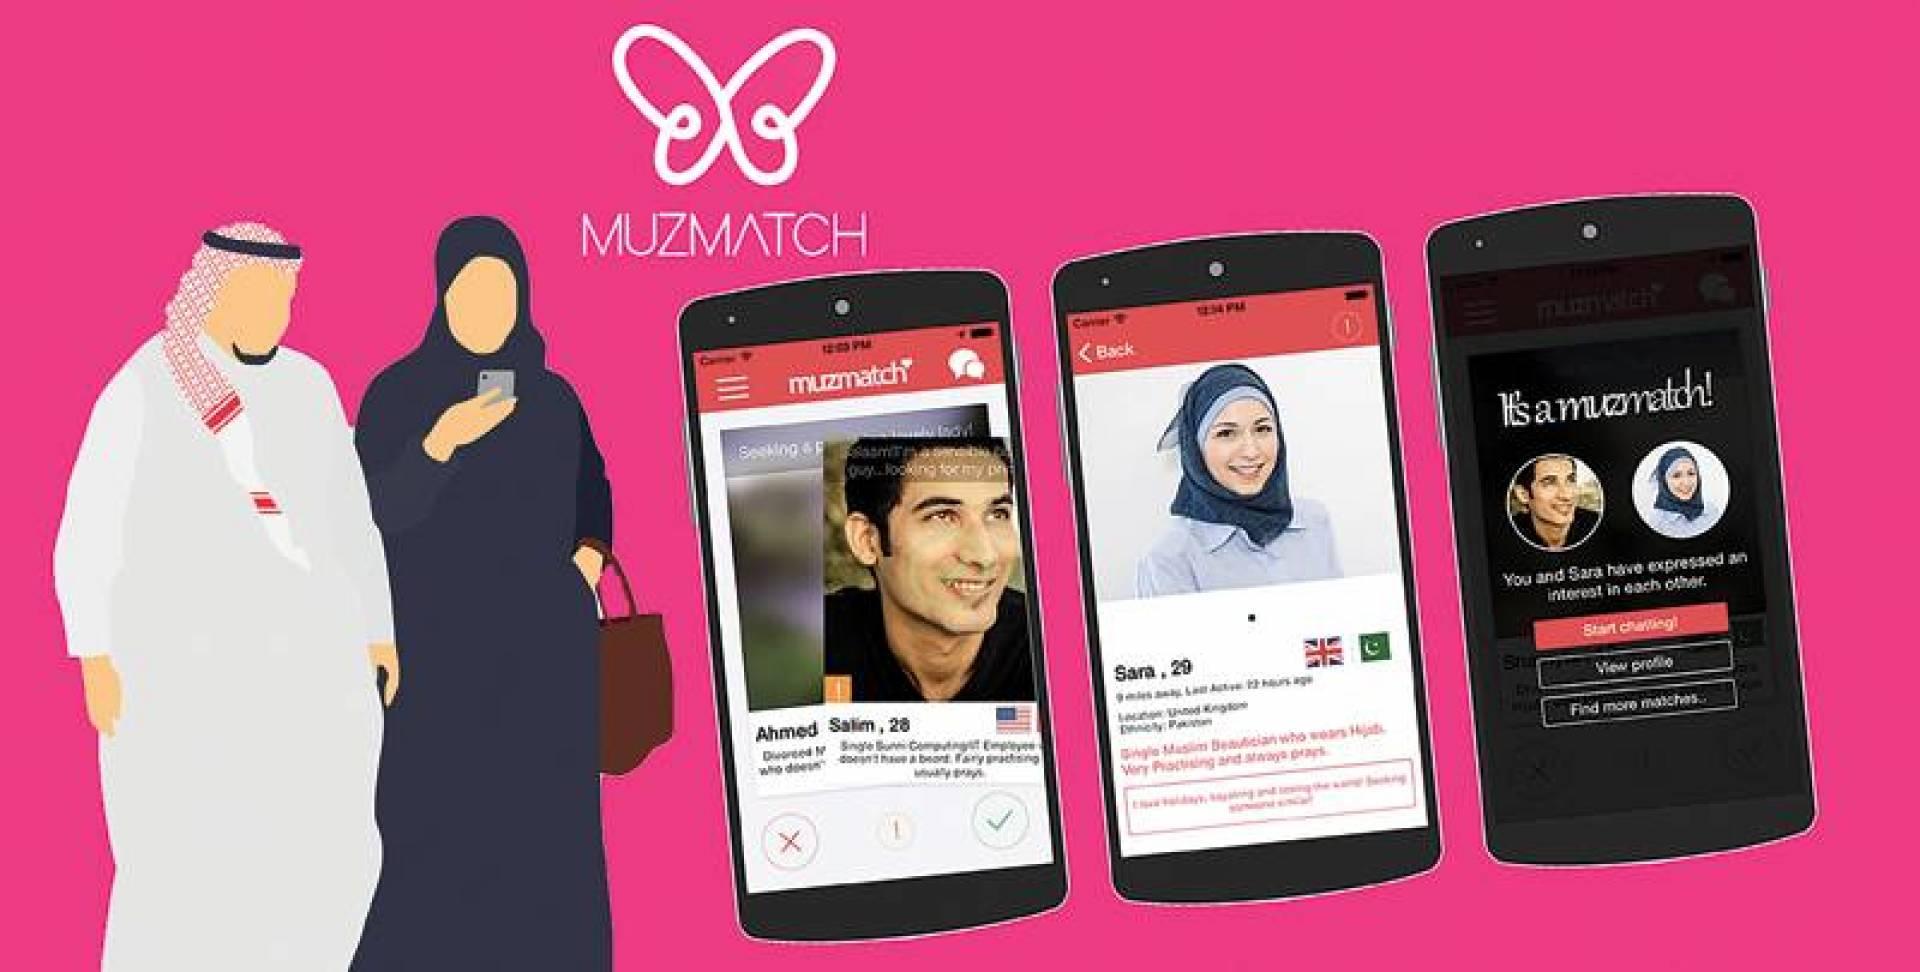 تطبيق إسلامي للتعارف.. يجمع 7 ملايين دولار